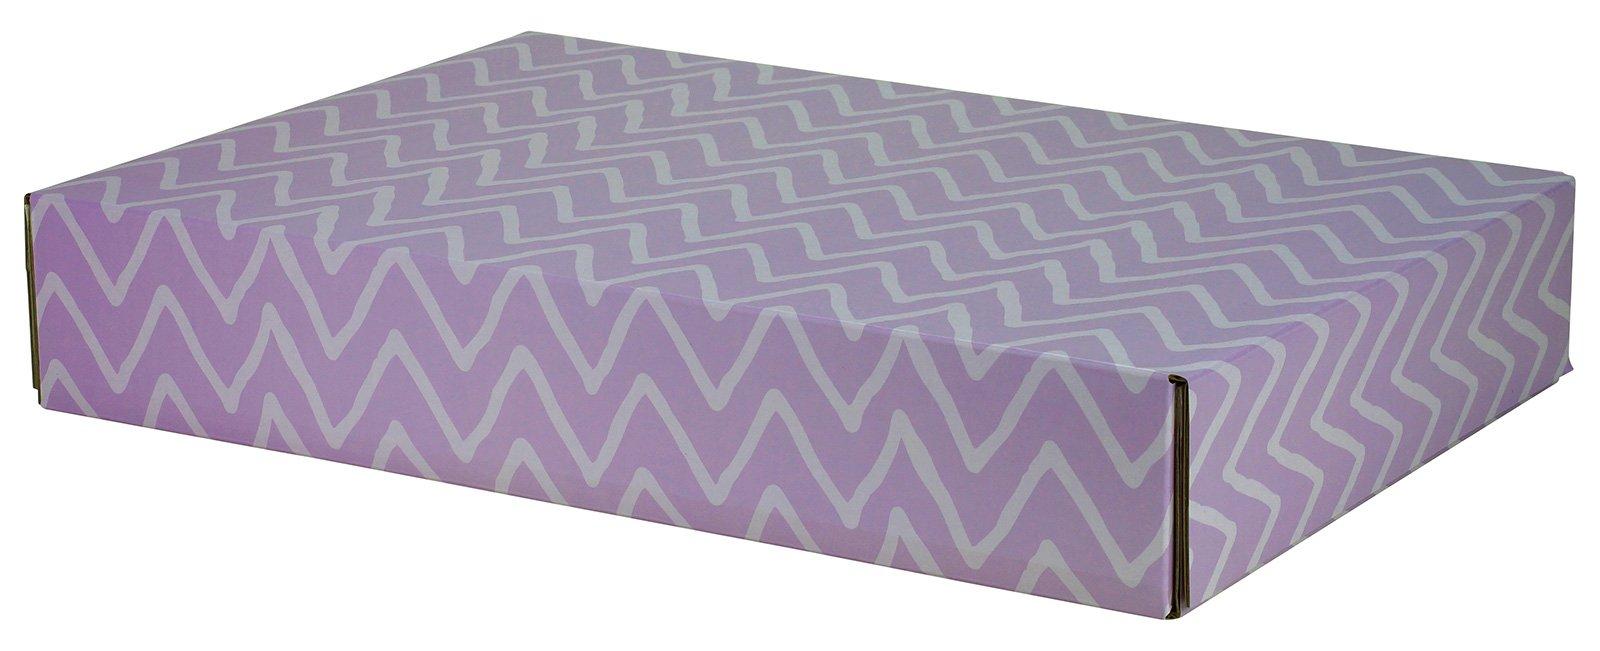 Gift Shipping Box, Classic Line, Purple Zig Zag (Large Size - 48 Pack)